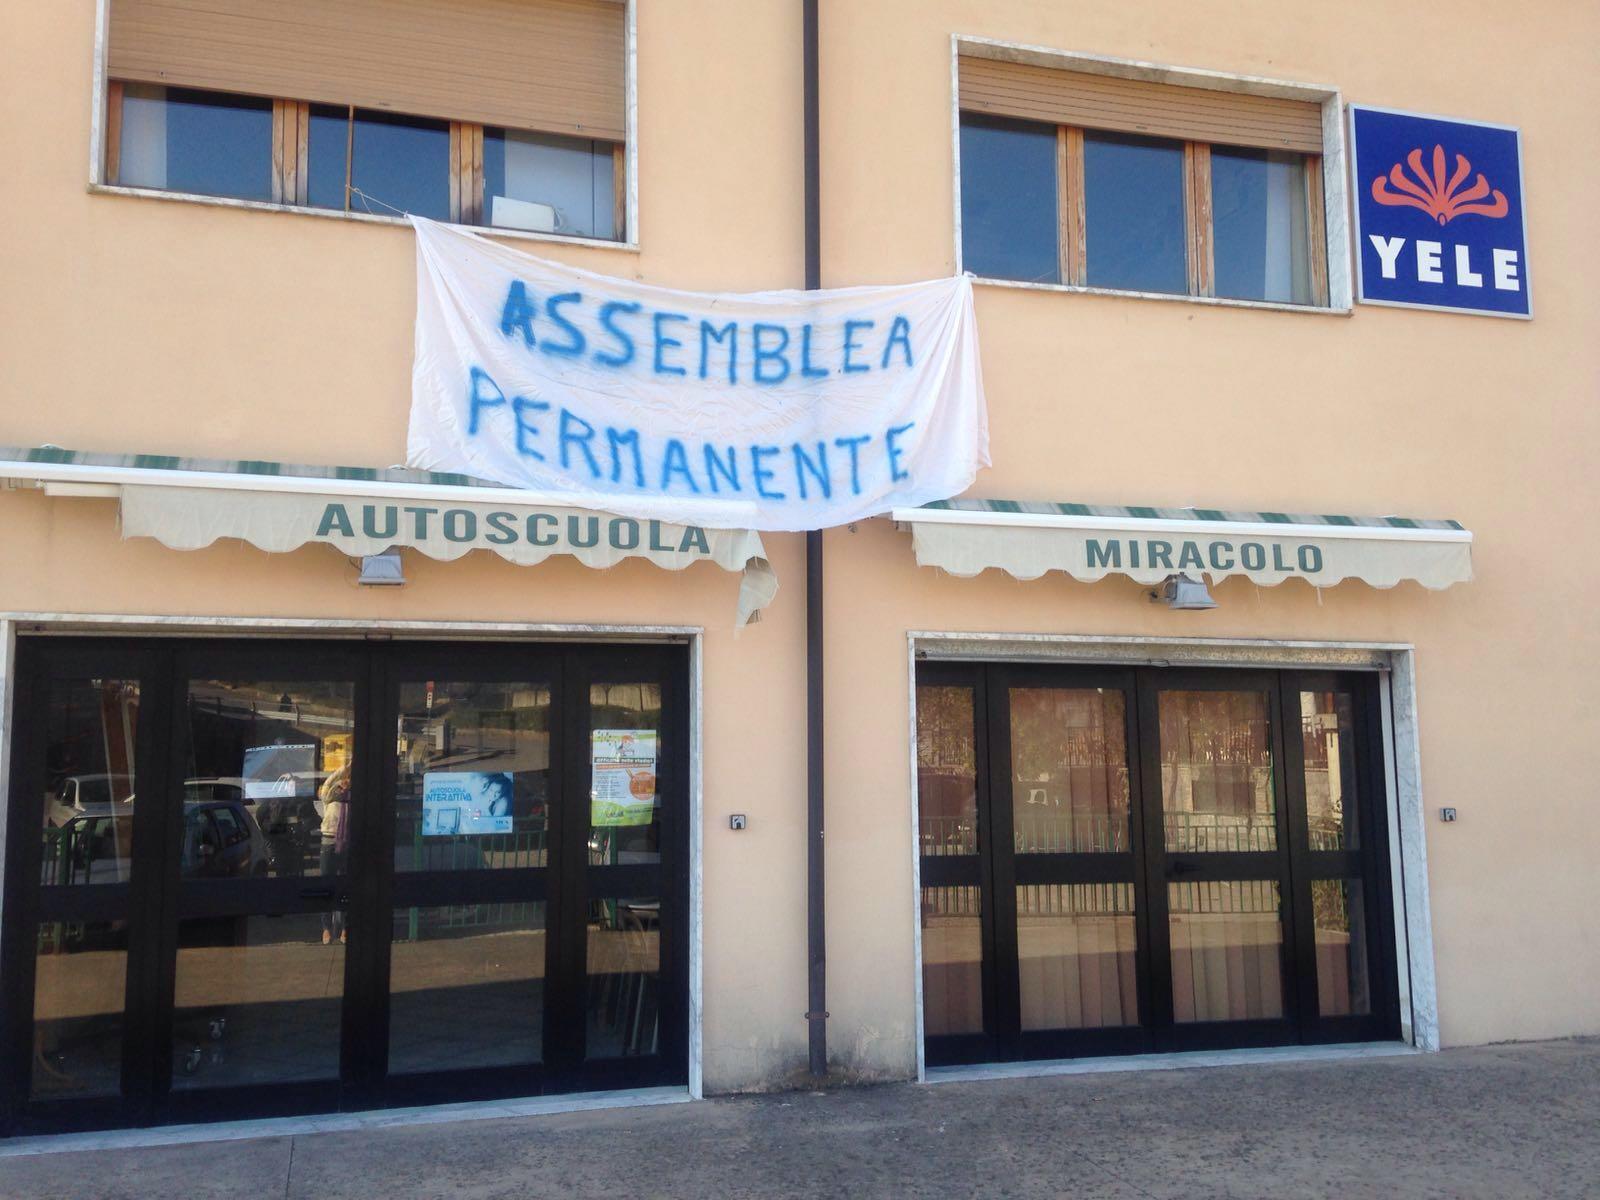 yele_assemblea1